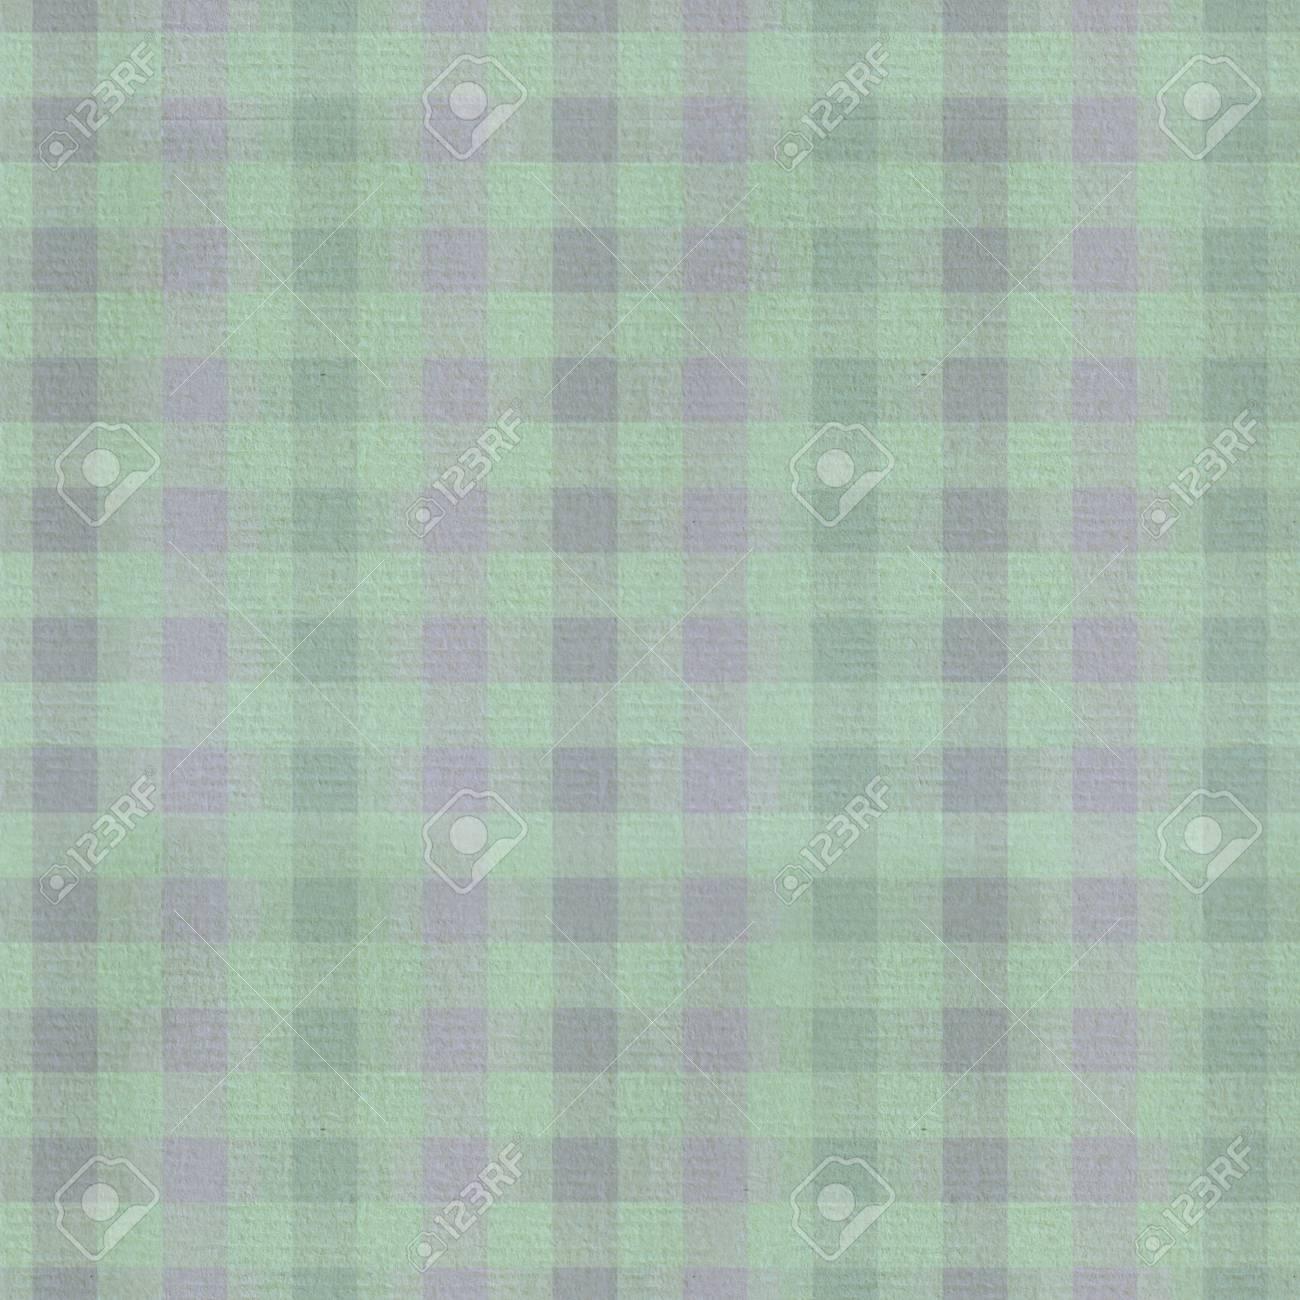 Retro - texture pattern Stock Photo - 12973447